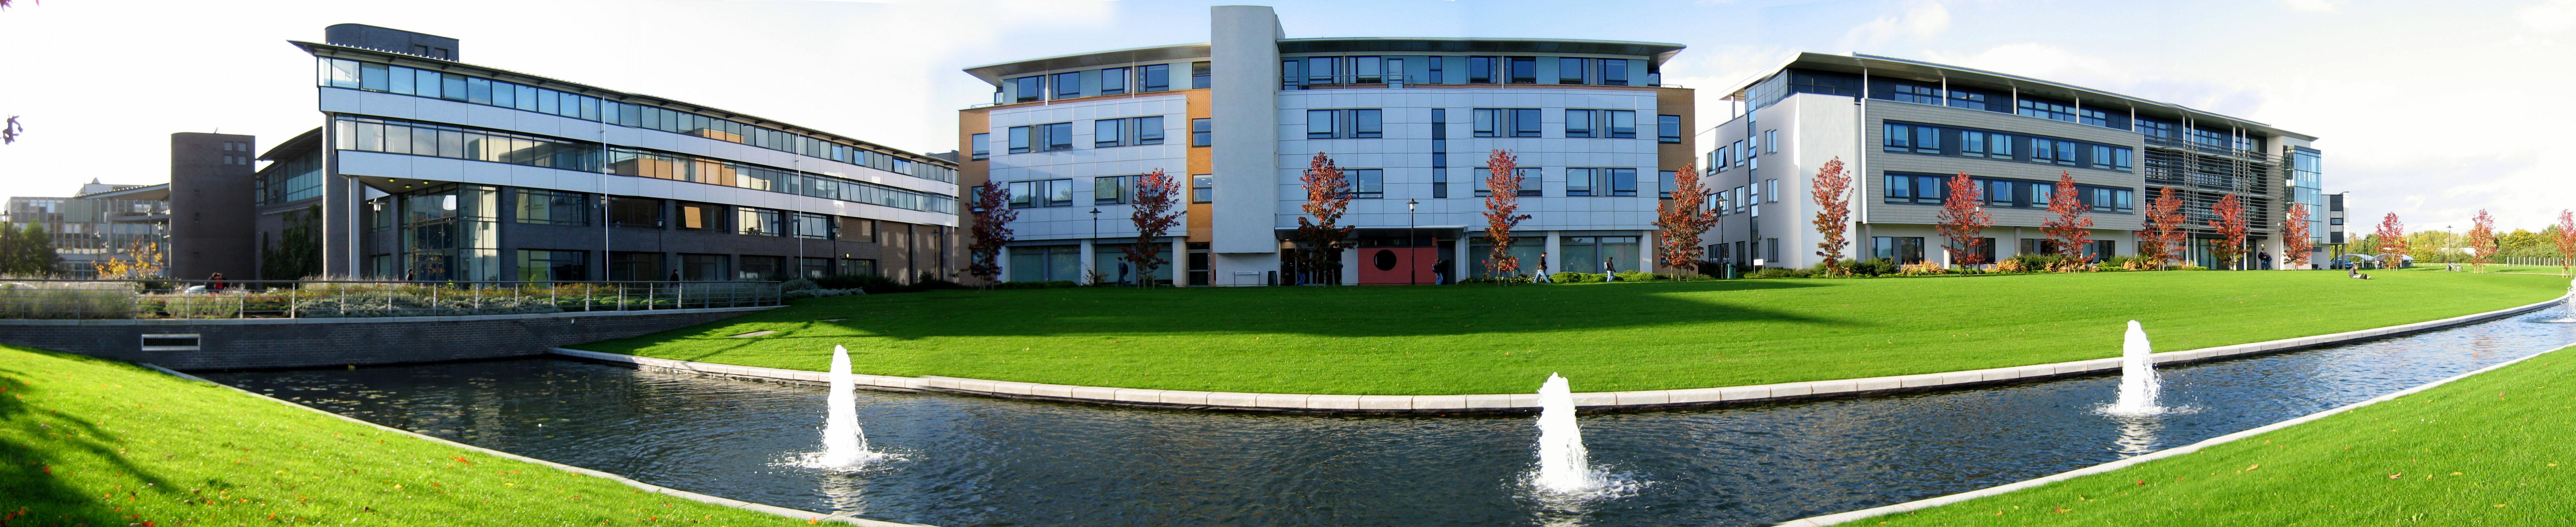 Cs University Of Aberdeen Student Room